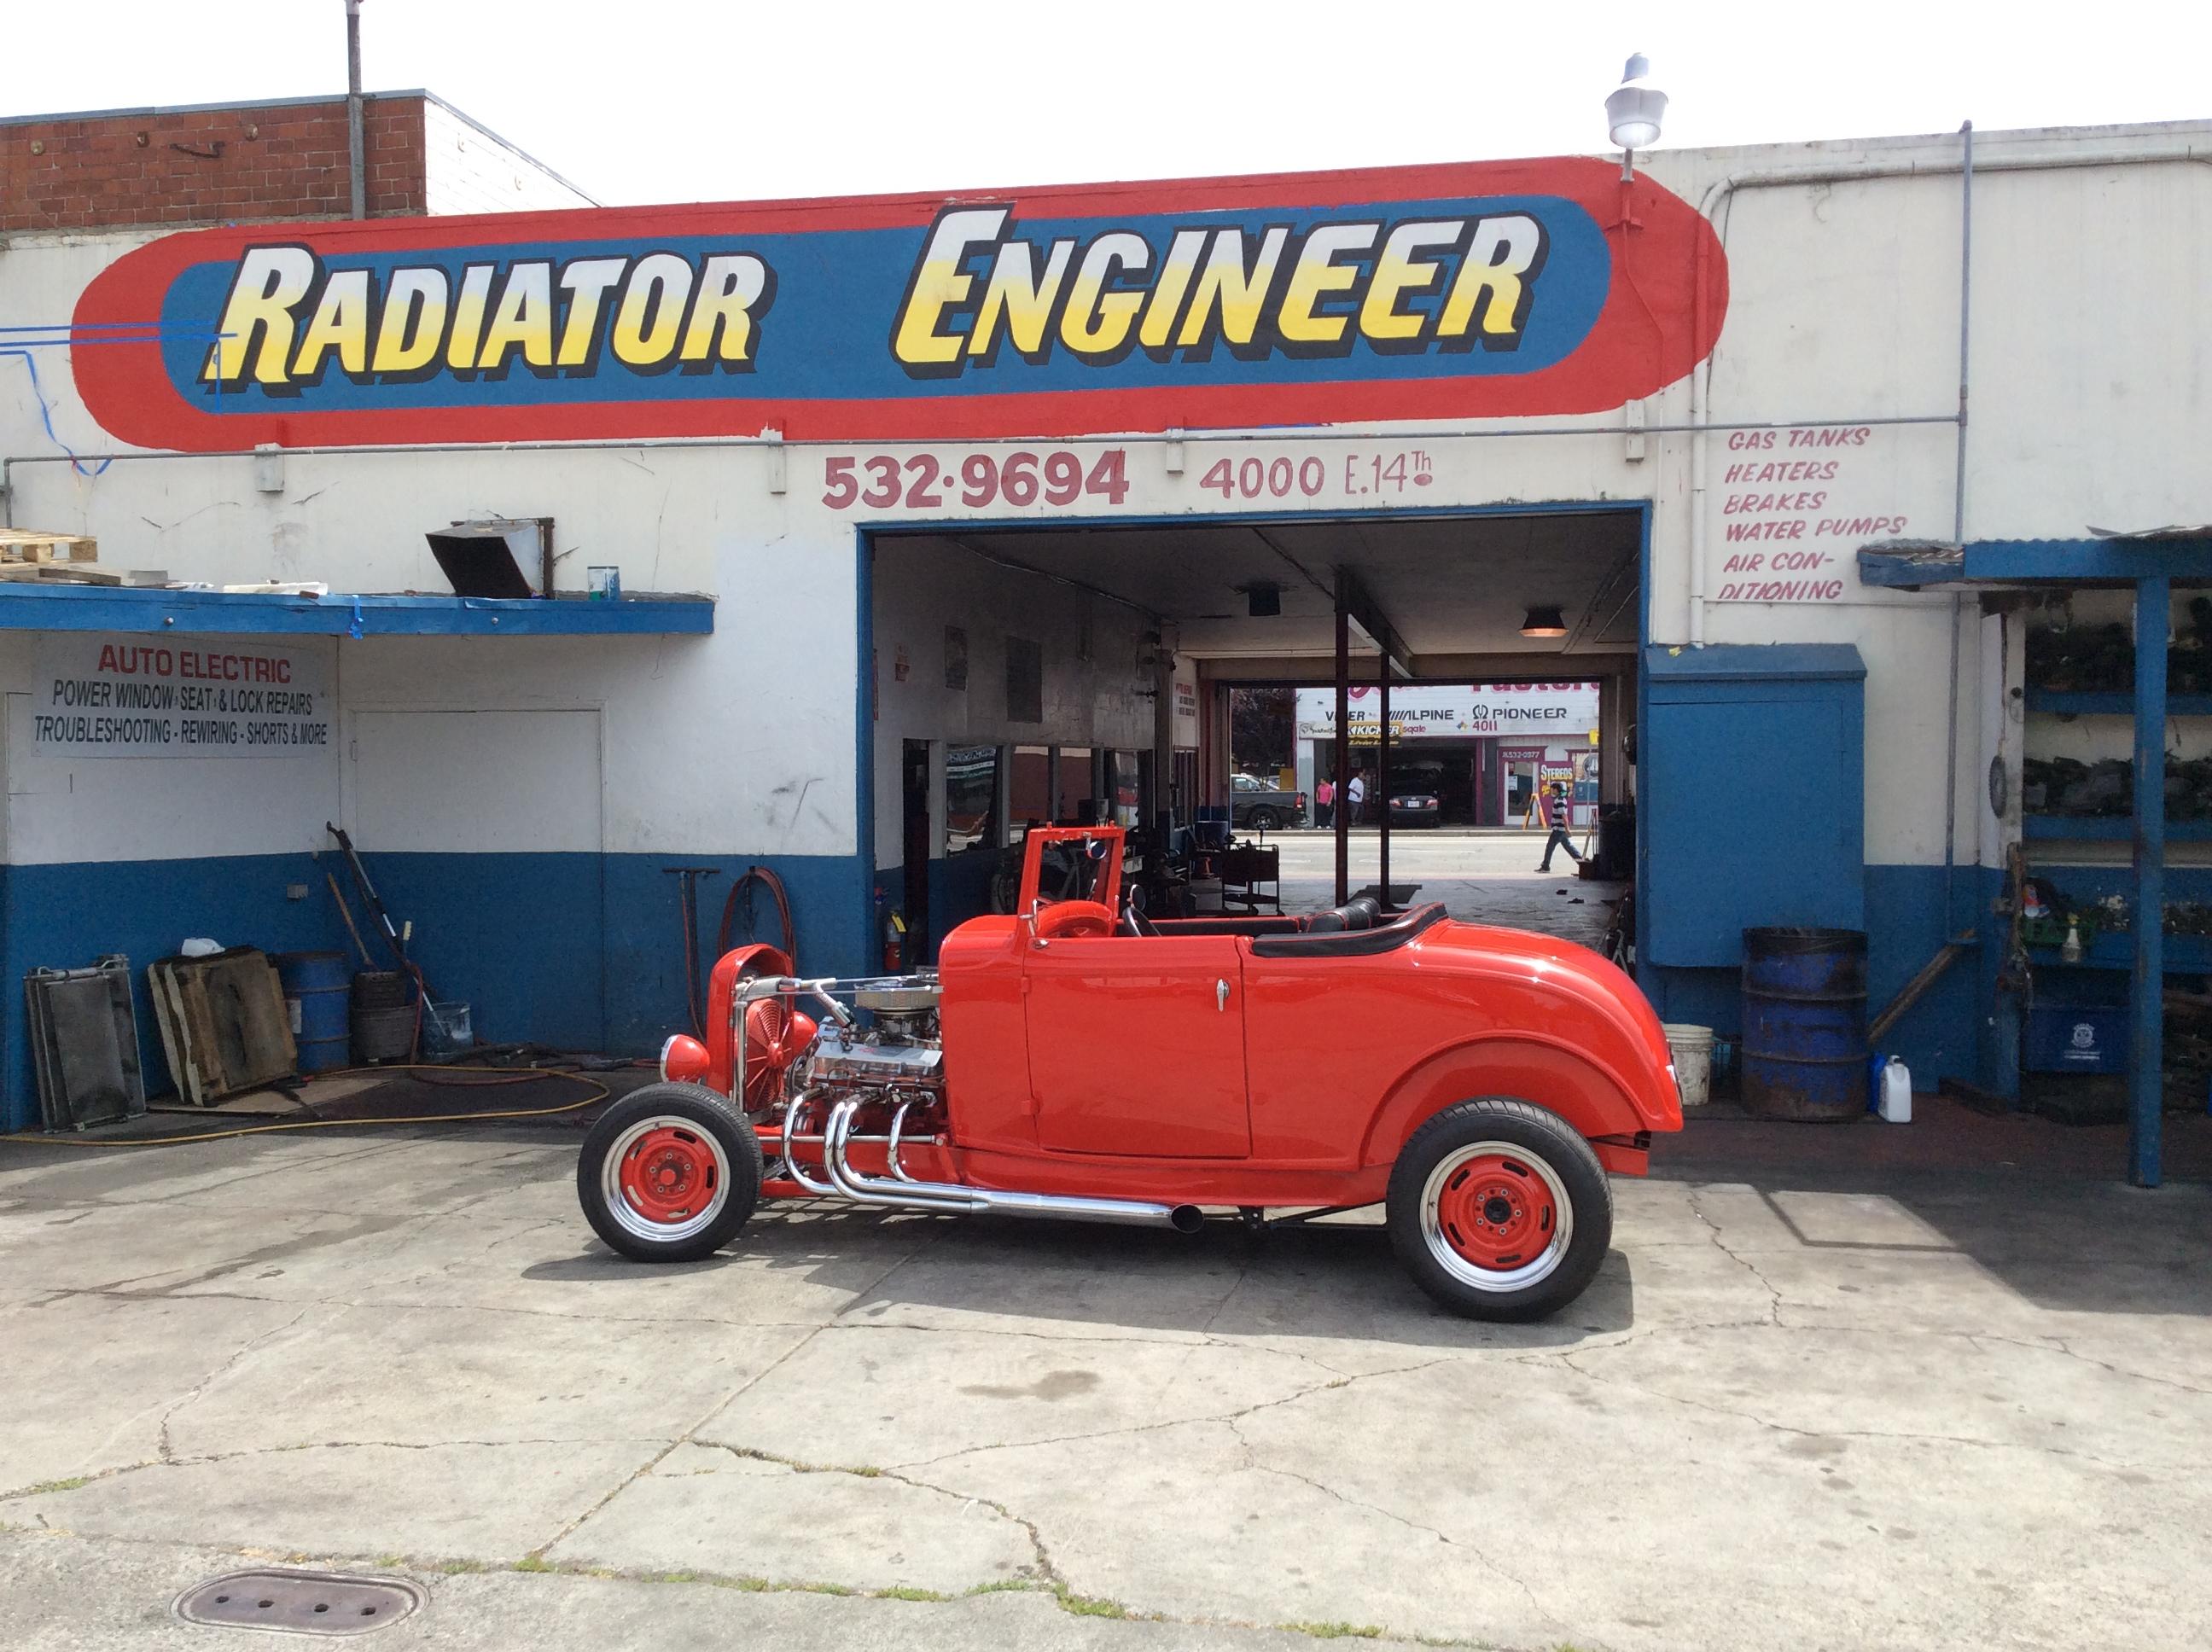 Radiator Engineer